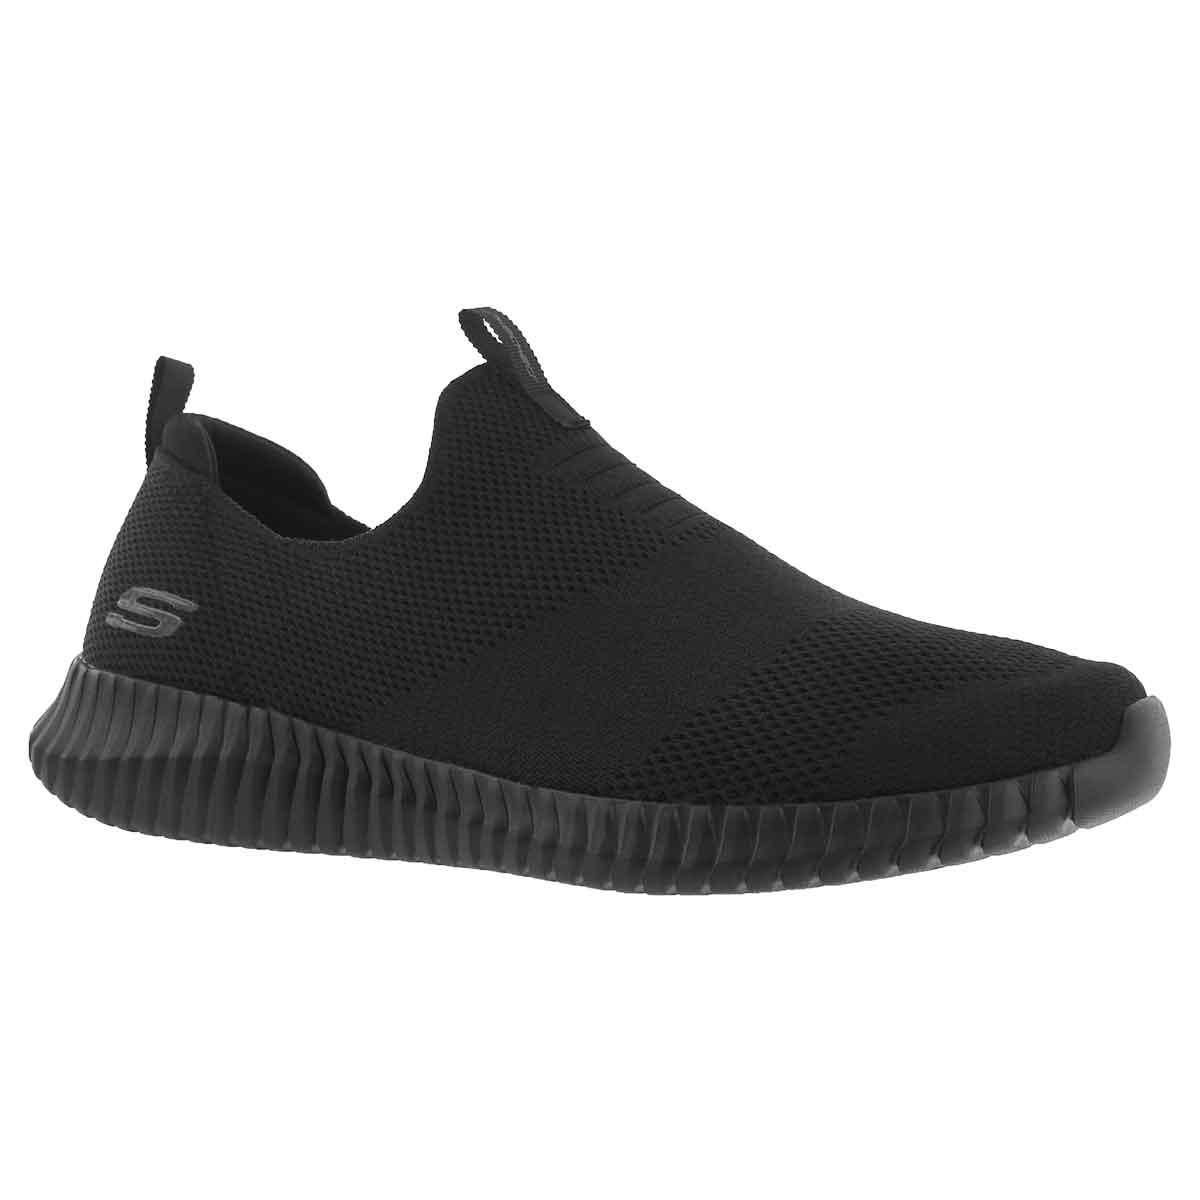 Men's ELITE FLEX WASIK black slip on shoes